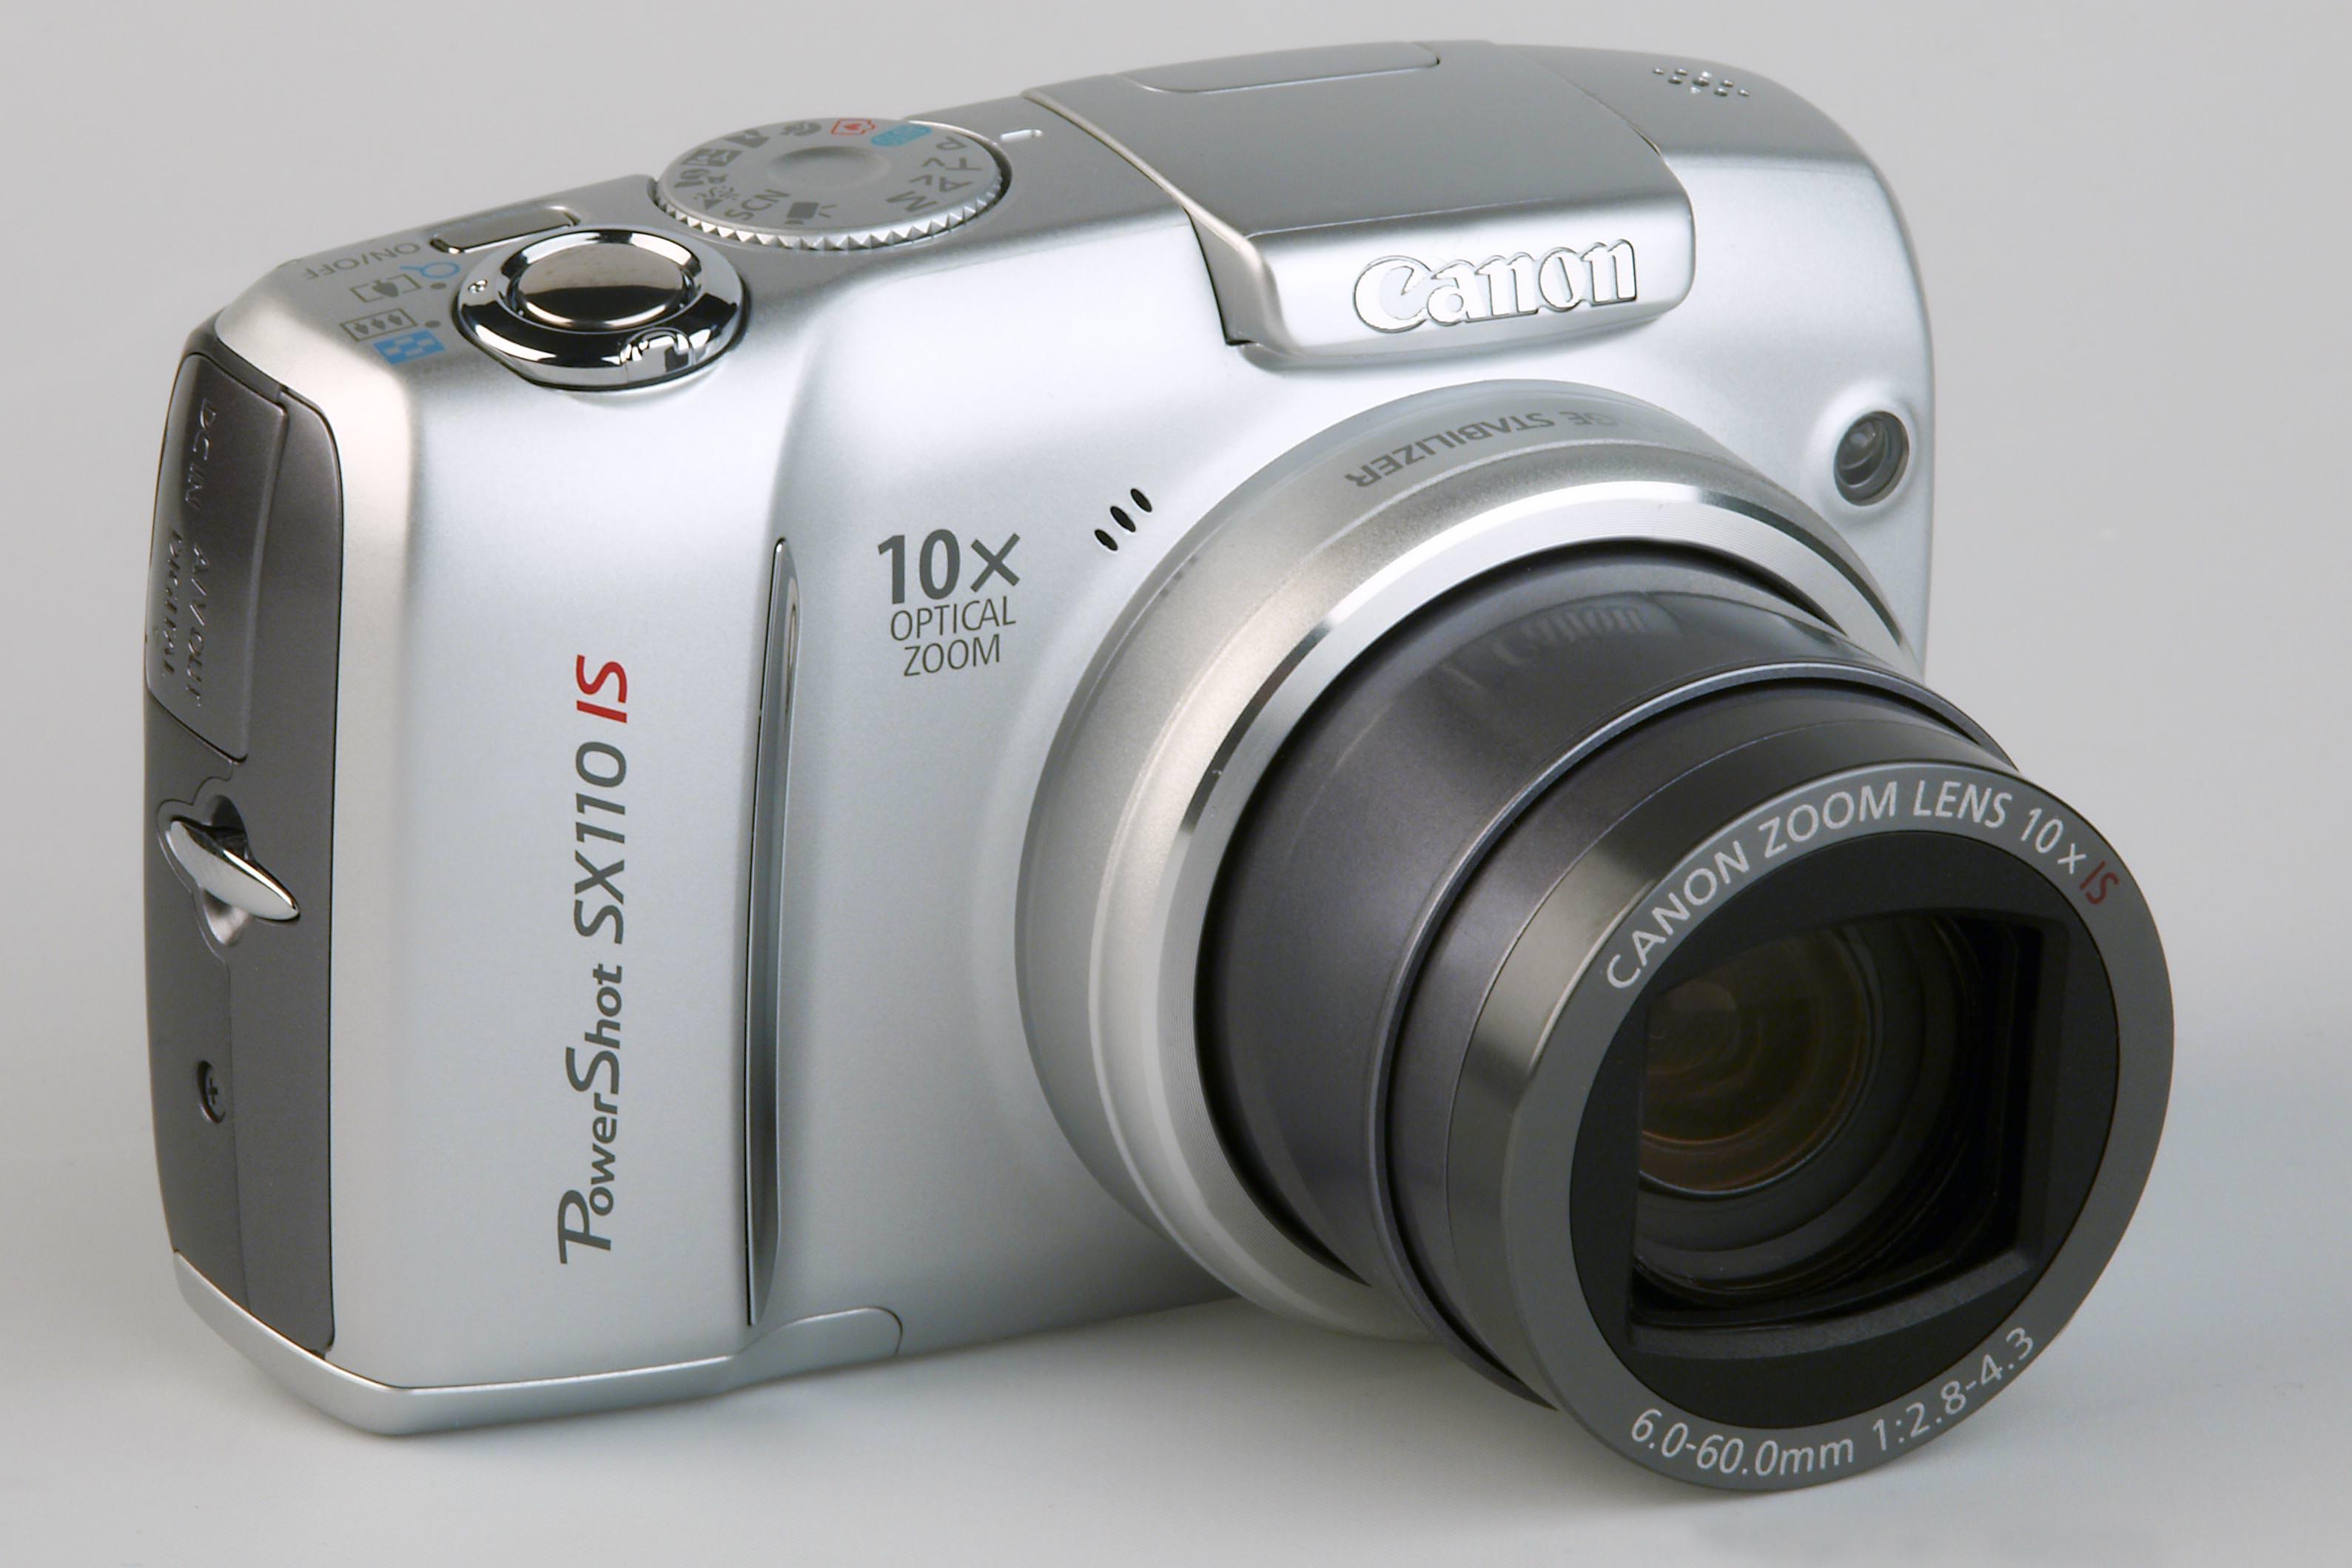 canon powershot sx110 is digital camera review rh ephotozine com canon powershot sx110 user manual canon powershot sx110 is manual english